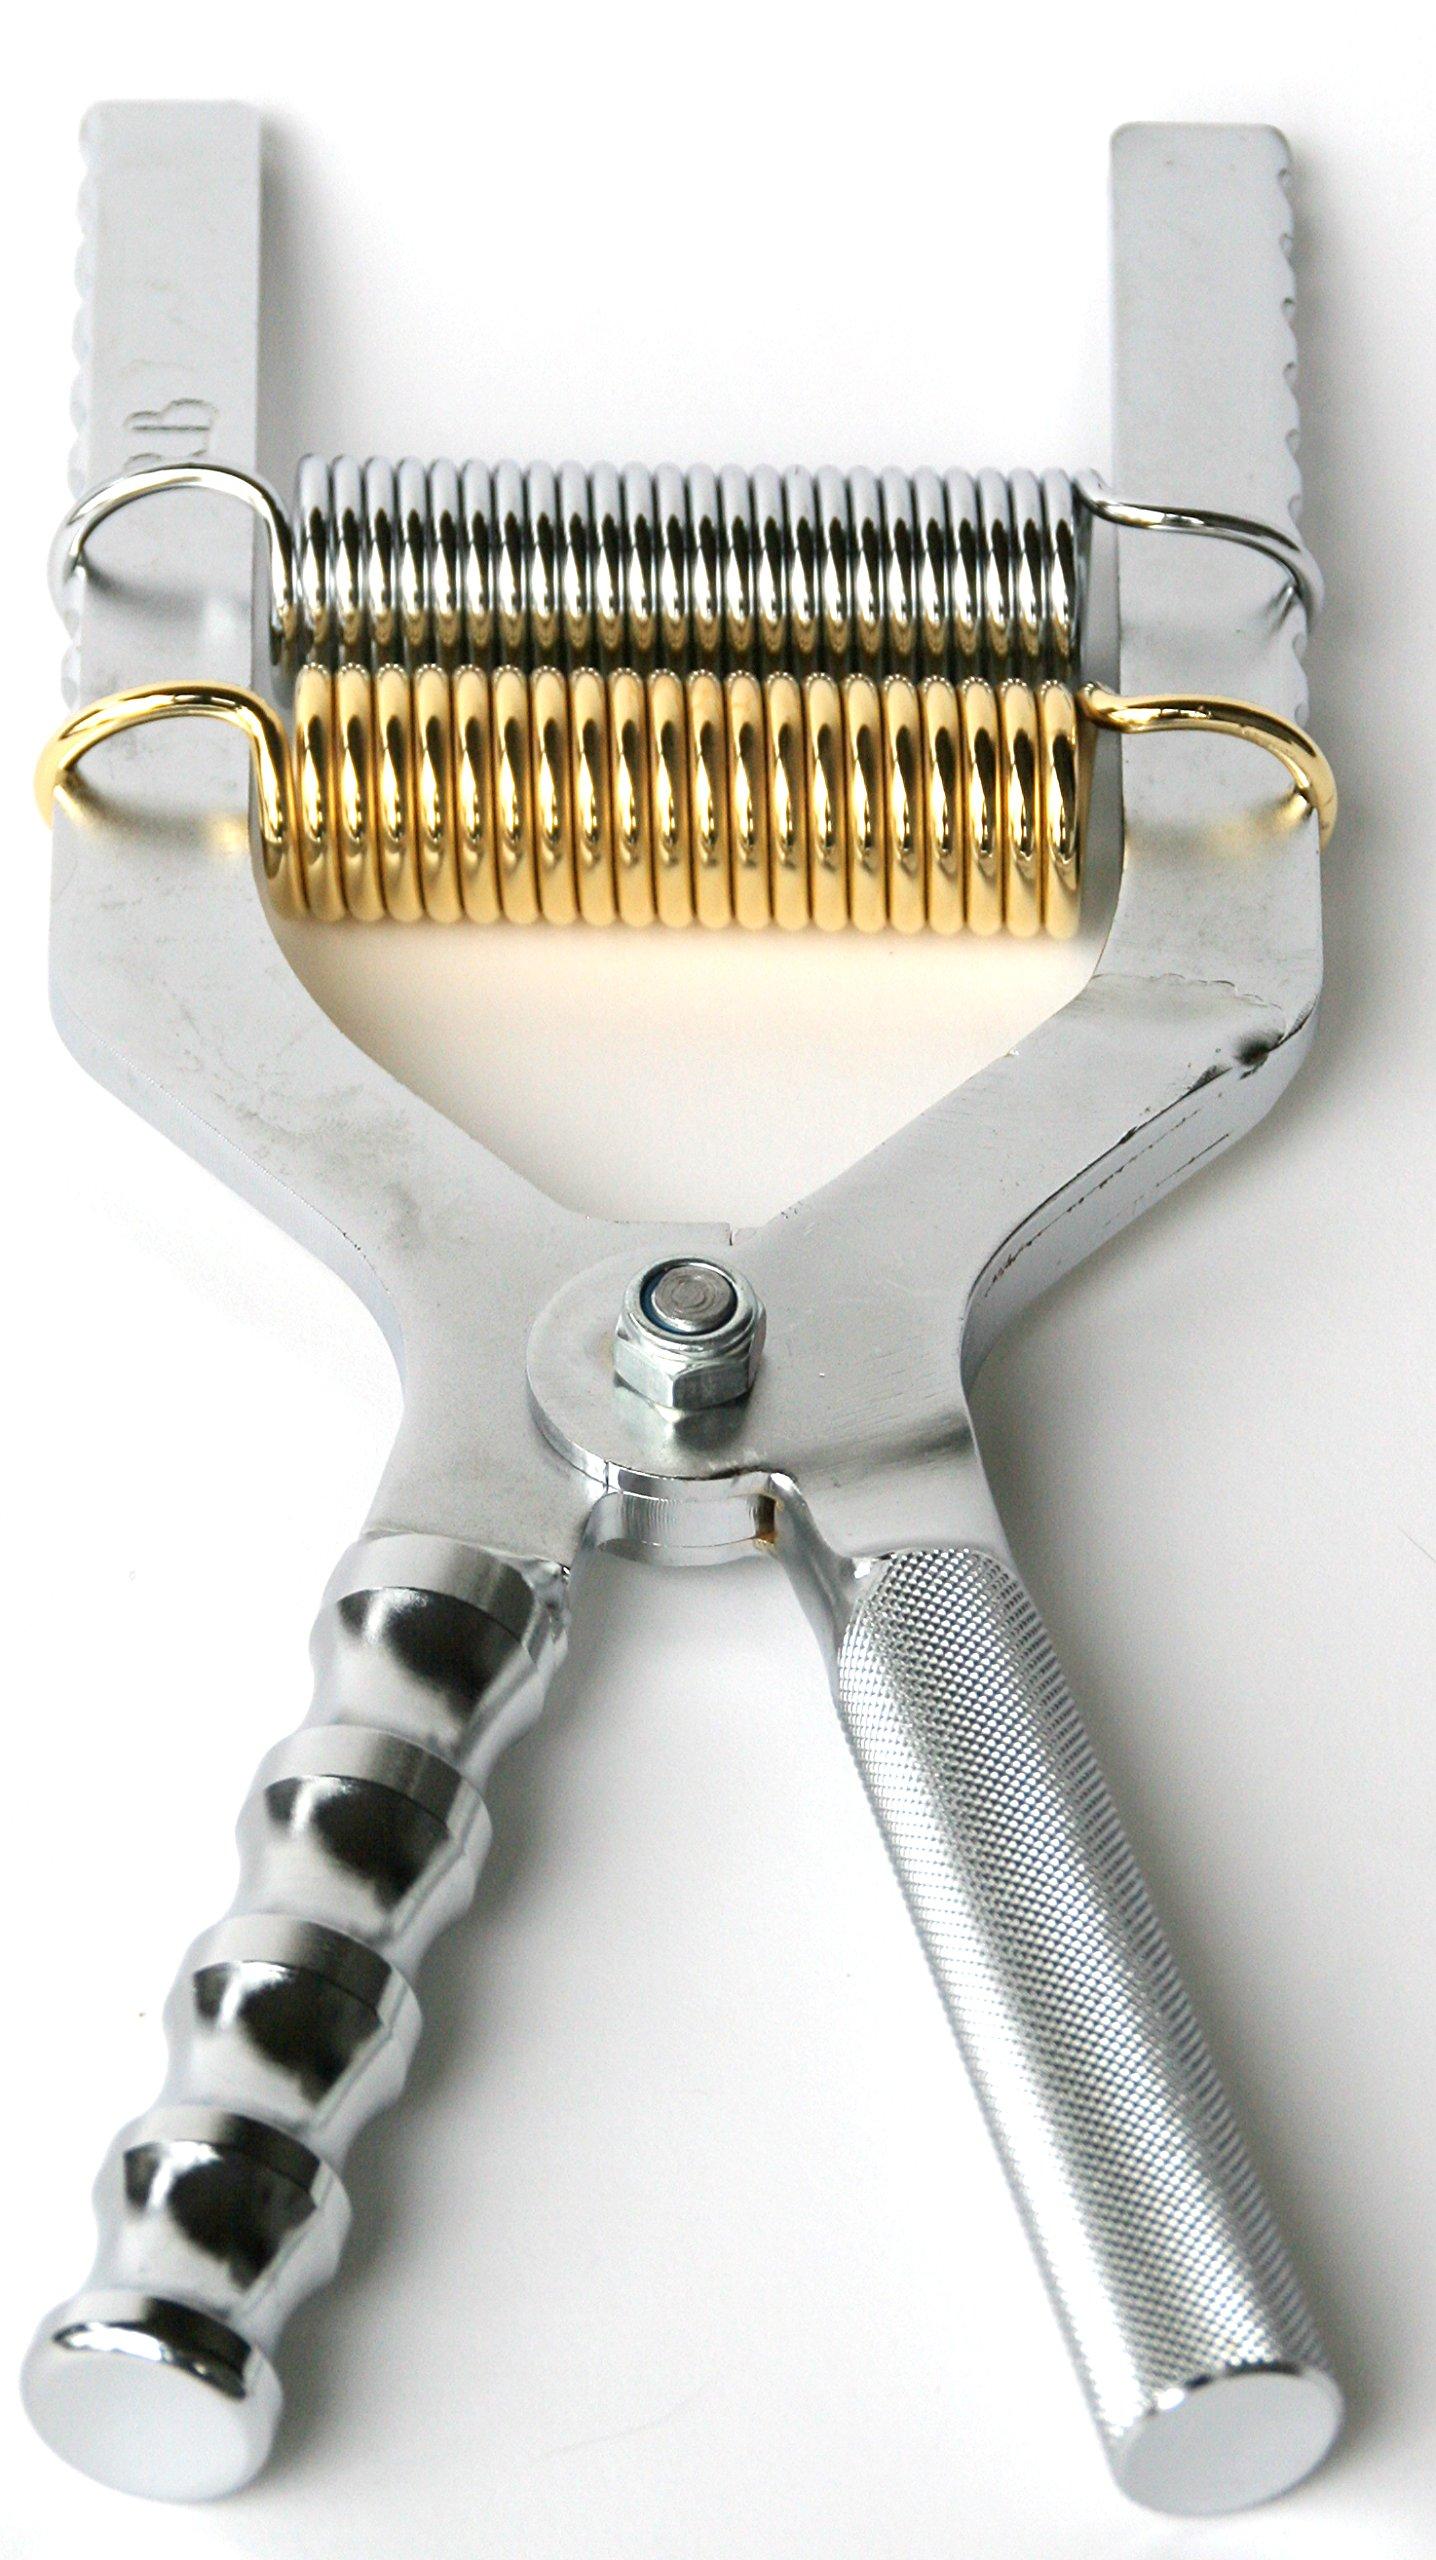 Robert Baraban Chrome Adjustable Hand Gripper 50/500lbs Resistance With Ergonomic Handle